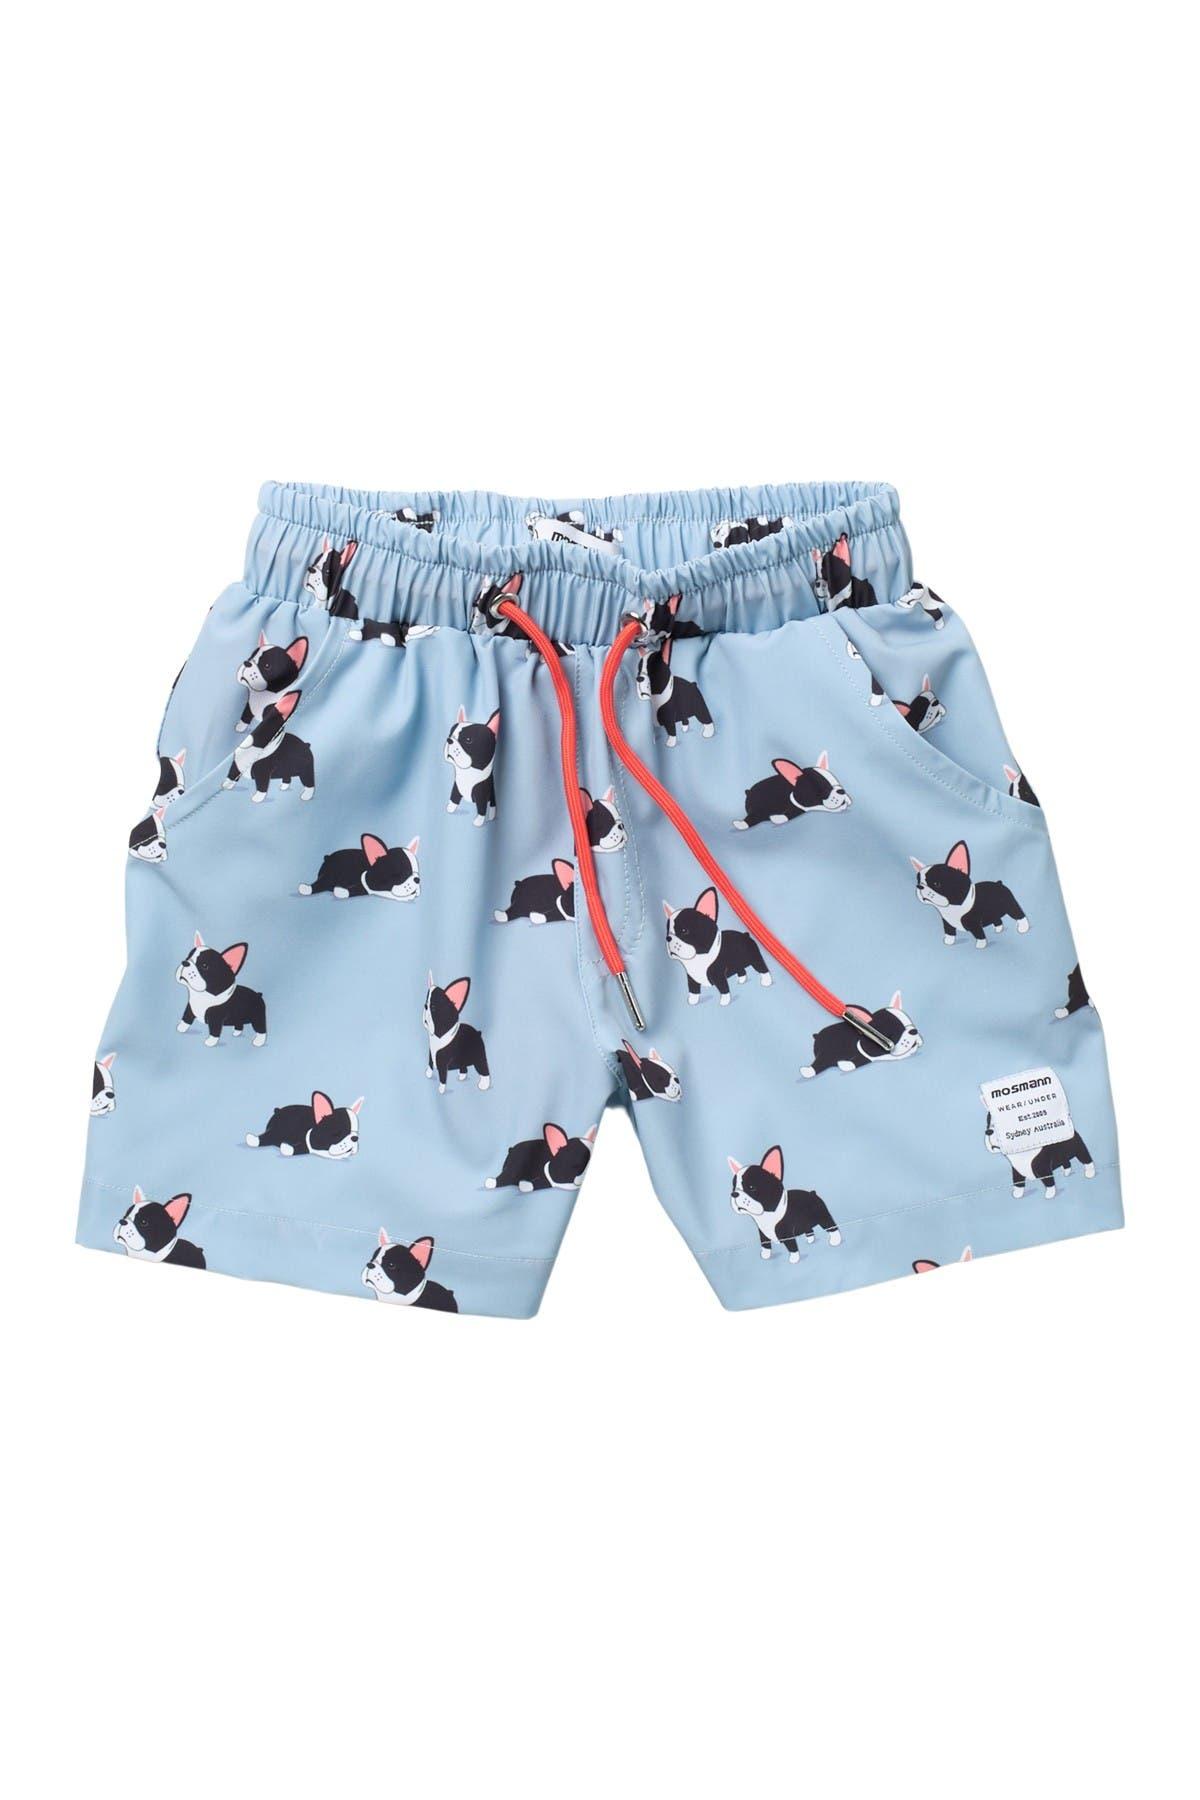 Image of Mosmann Australia Frenchie Print Swim Shorts